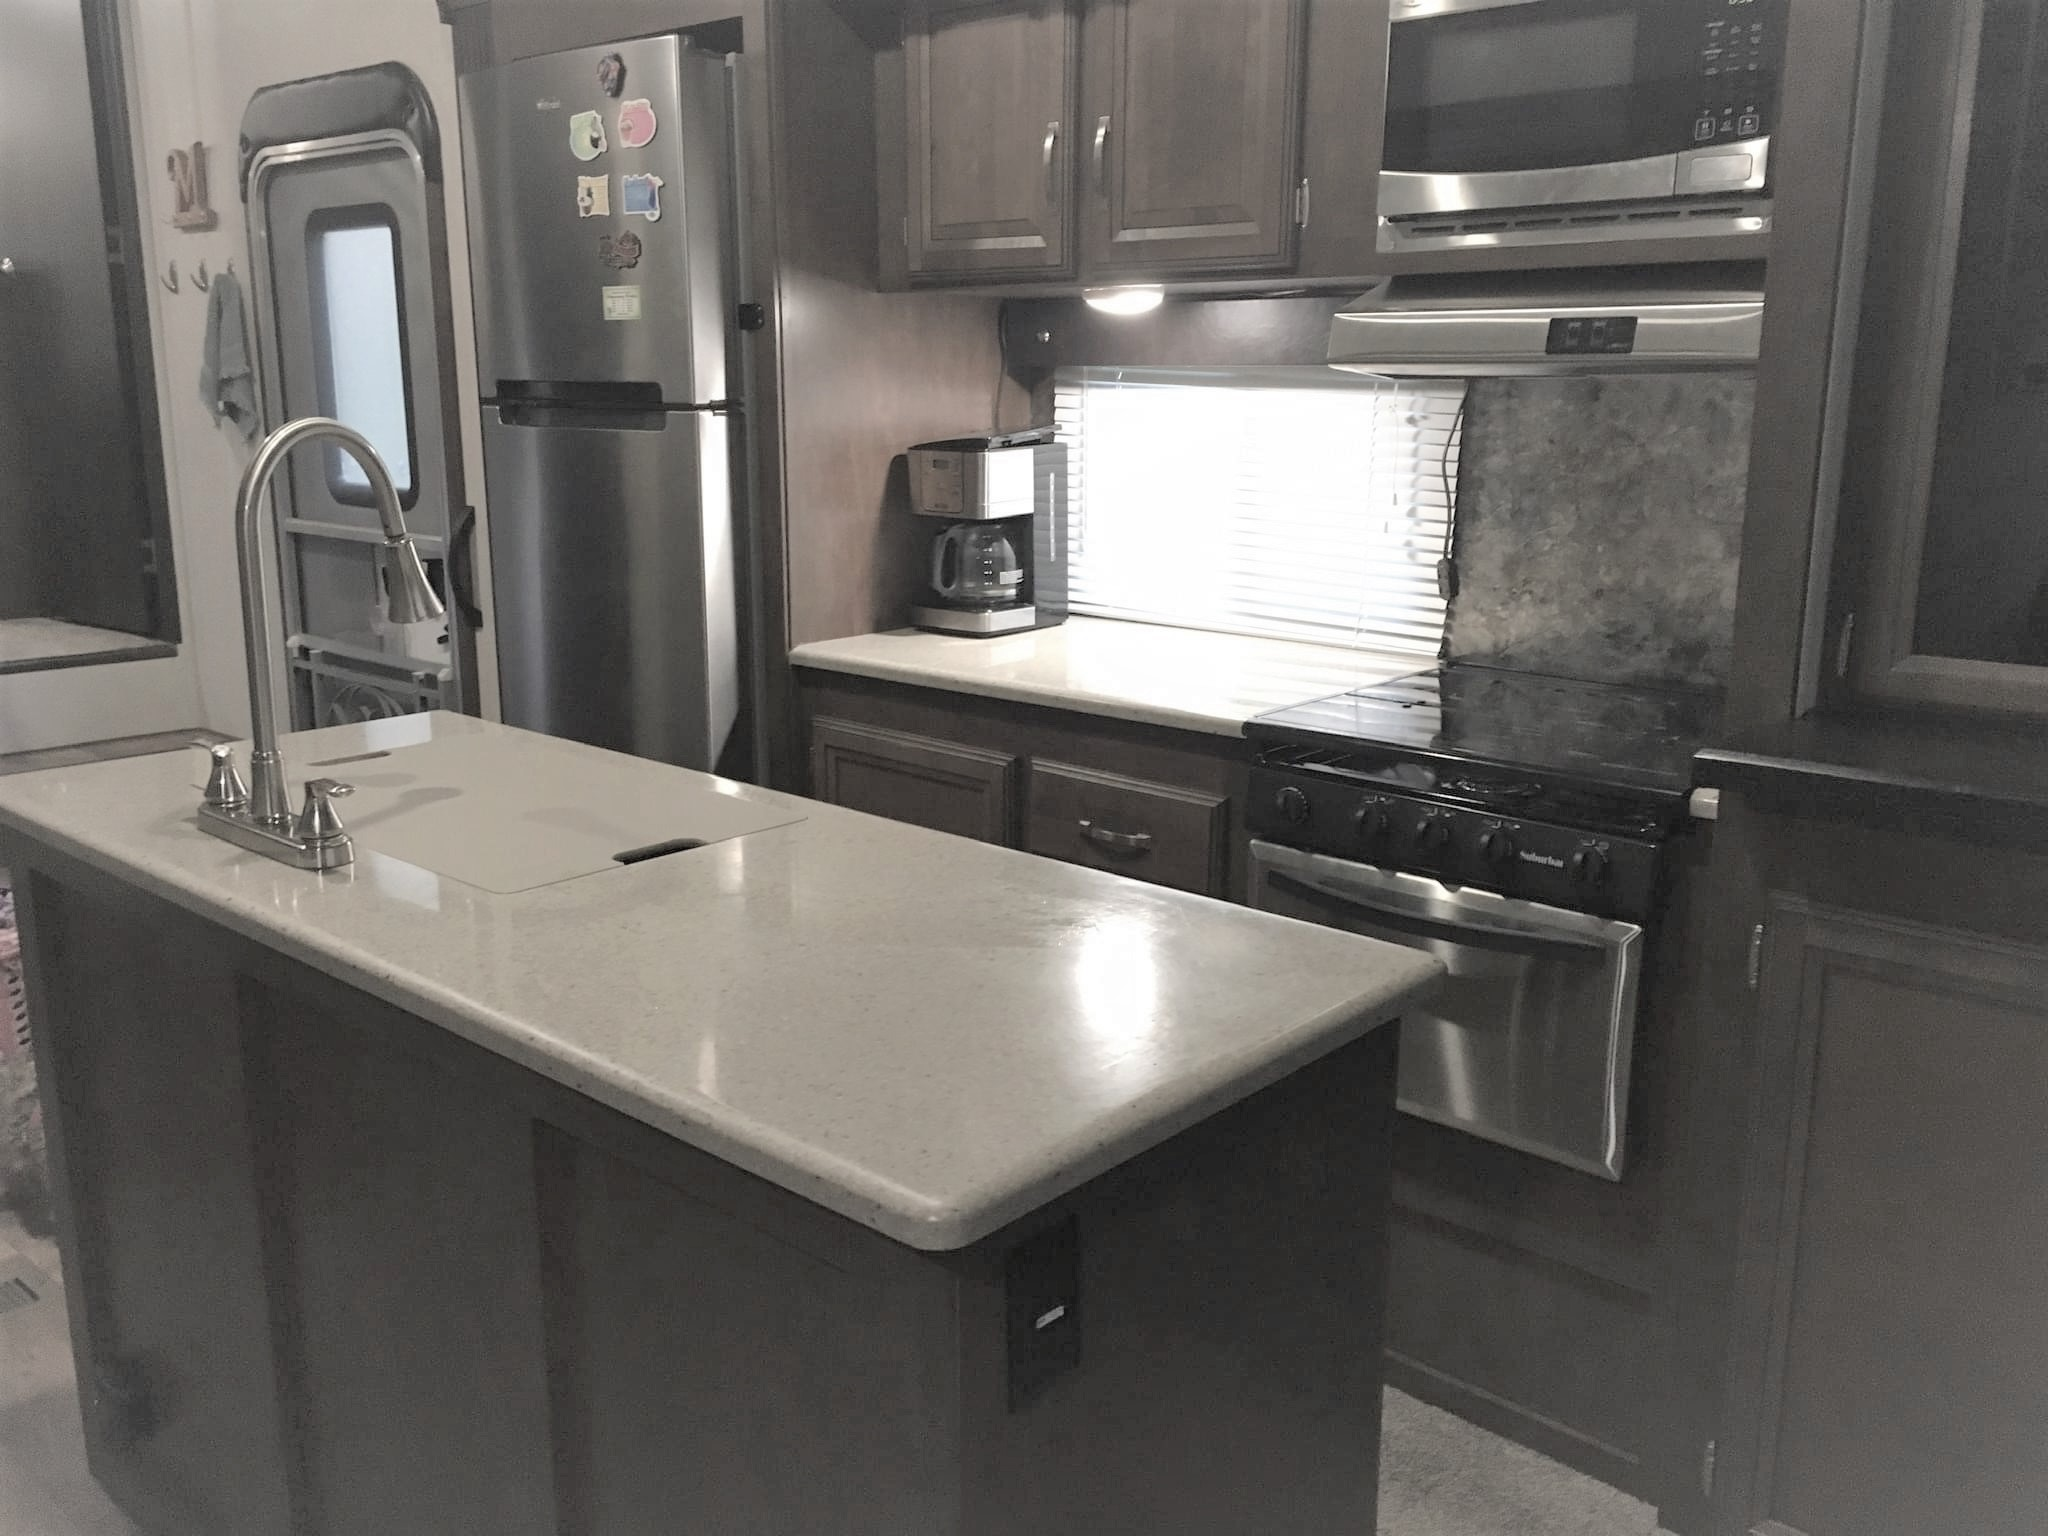 Kitchen. Forest River Salem Hemisphere 2017